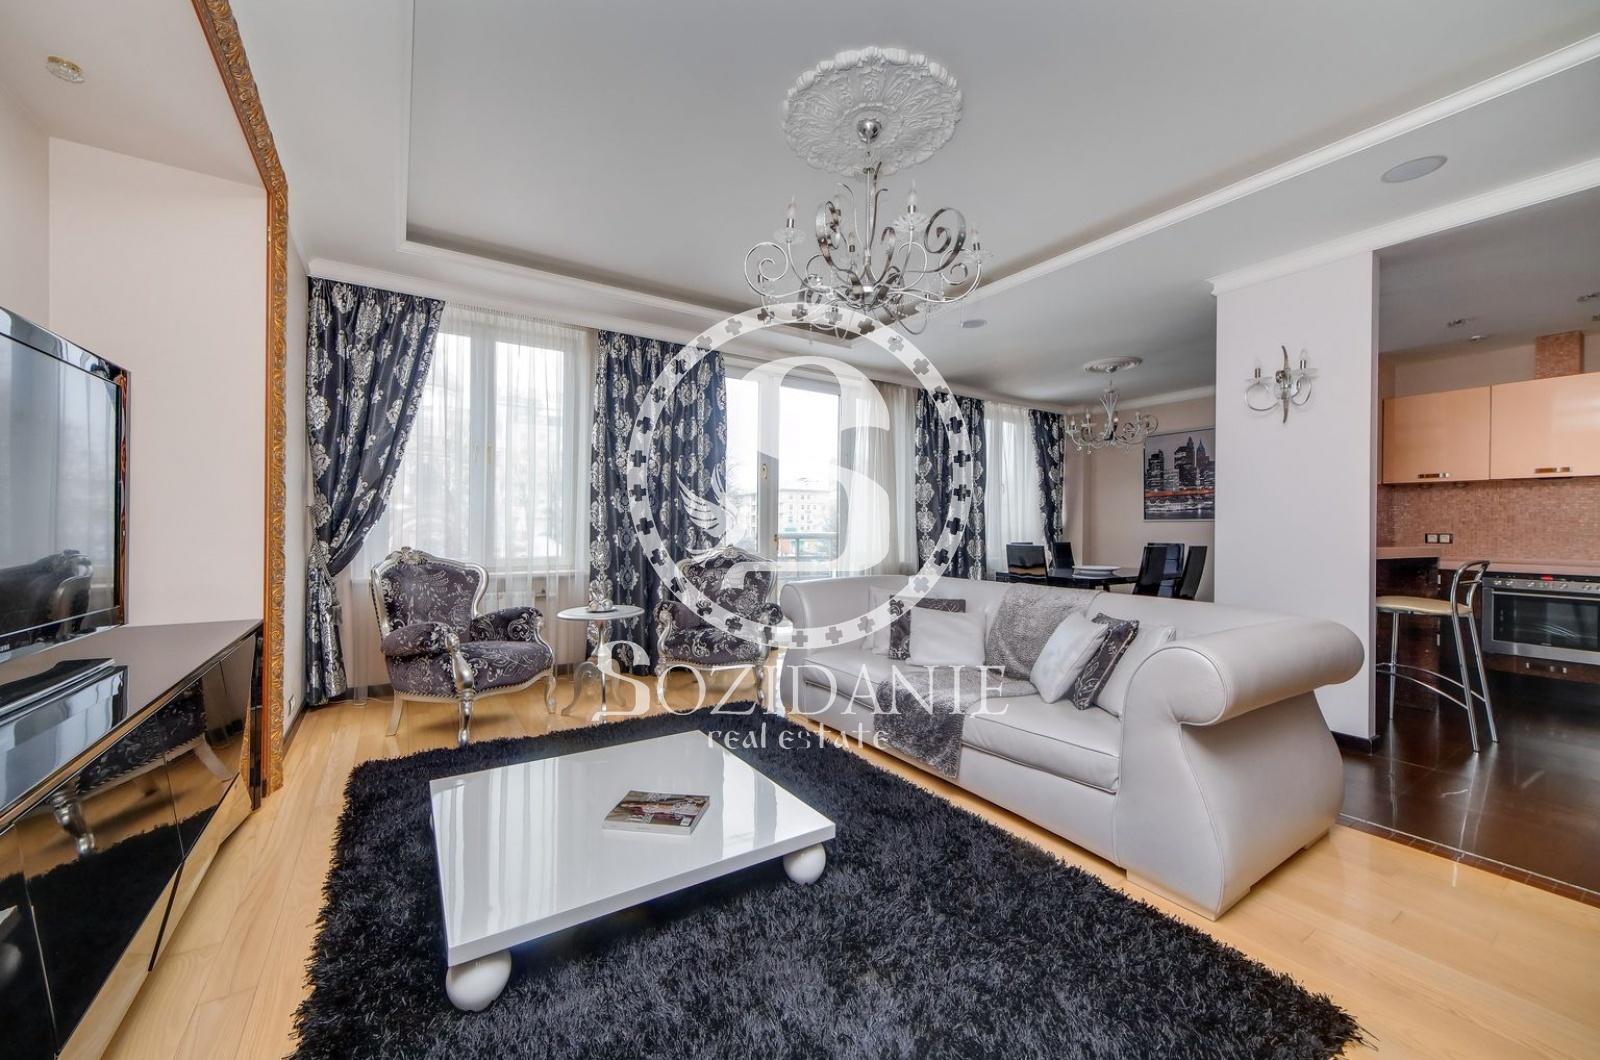 3 Комнаты, Городская, Аренда, Улица Большая Якиманка, Listing ID 1558, Москва, Россия,